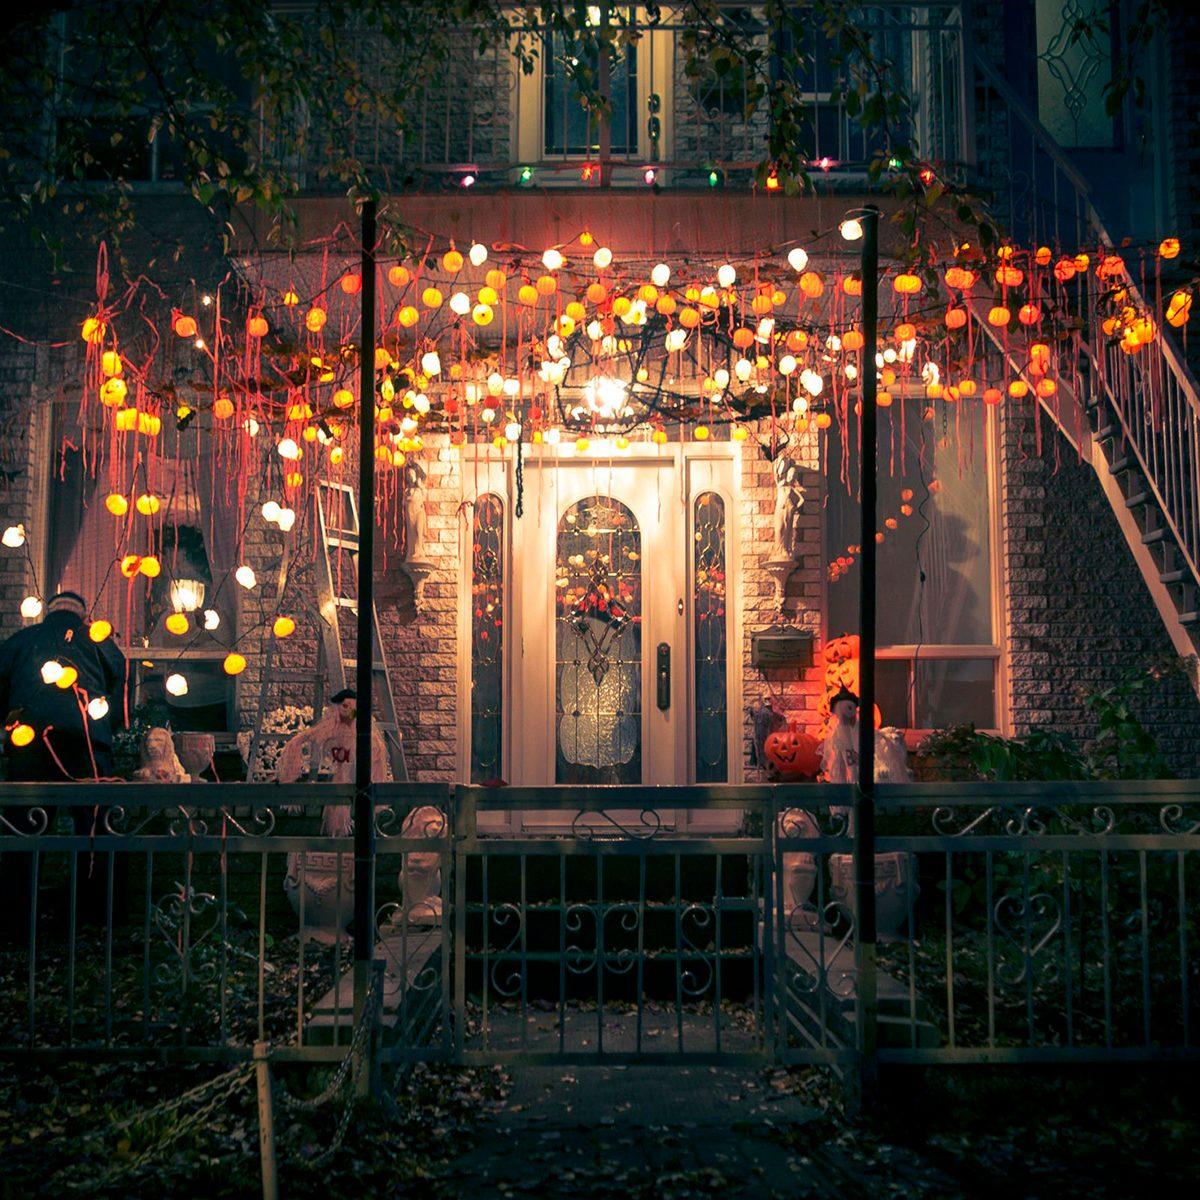 Elaborate front porch Halloween decorations